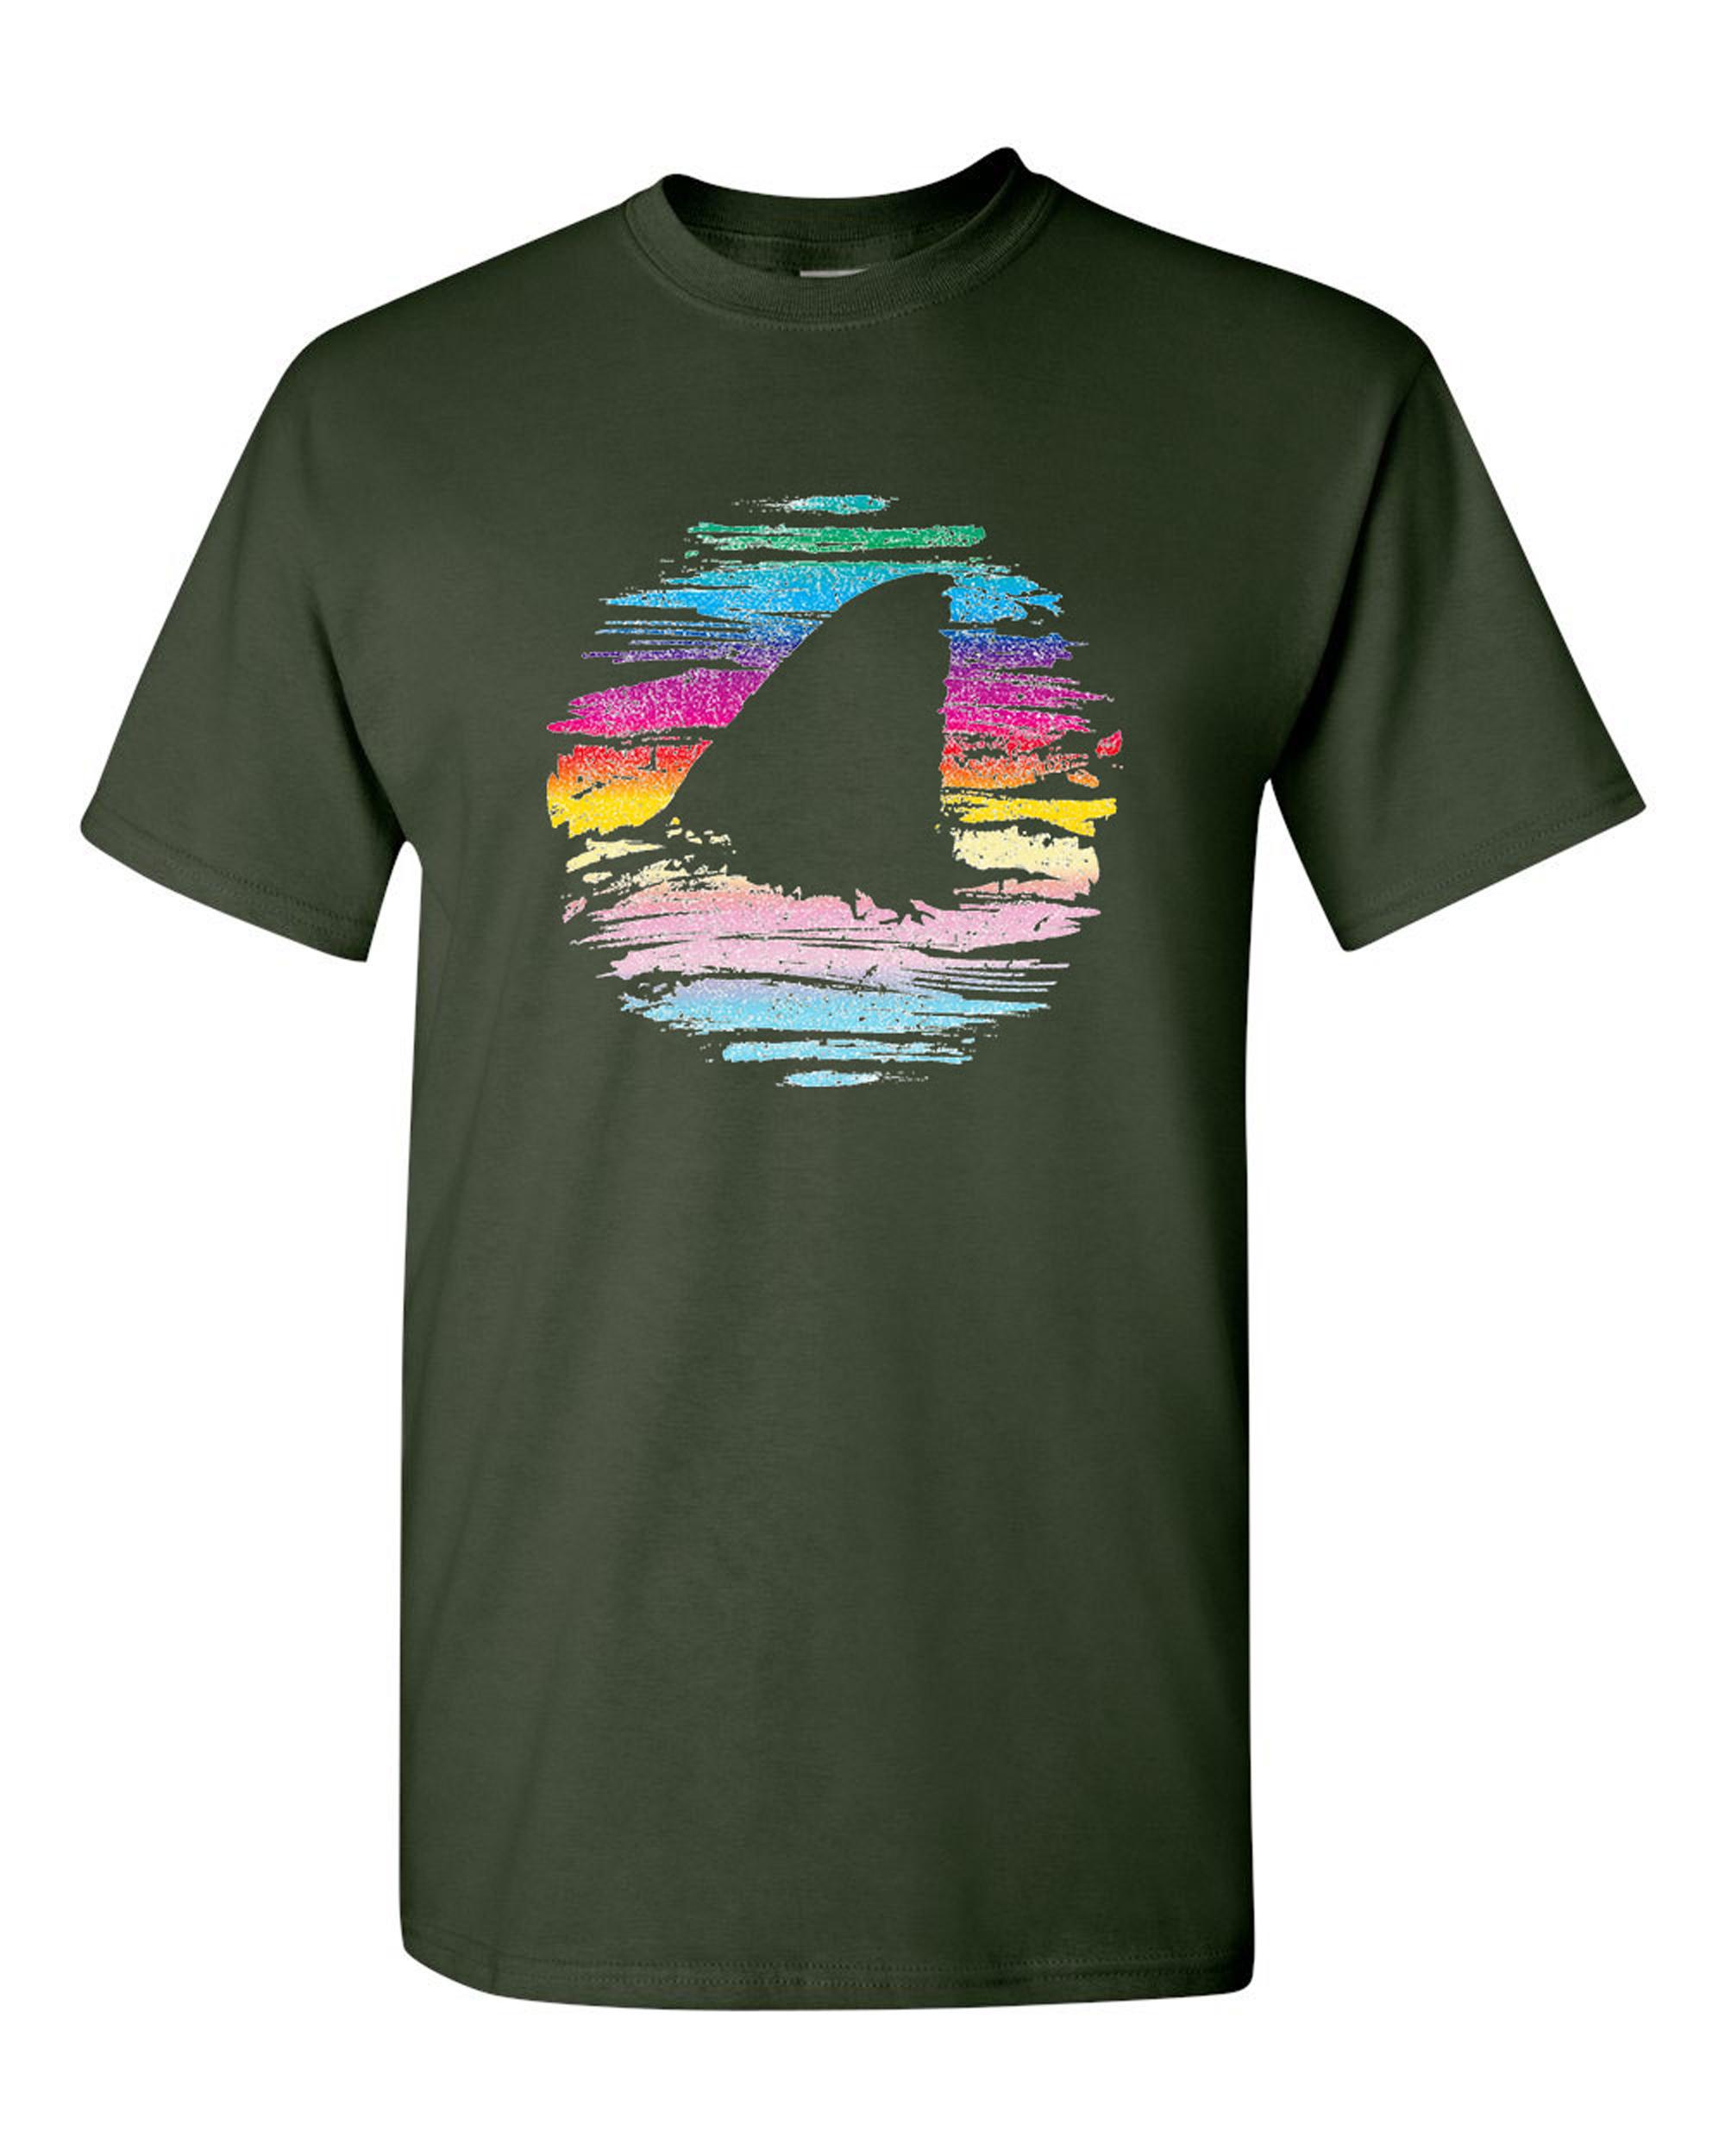 Shark Week BeanePod Artworks Art Funny DT Adult T-Shirt Tee